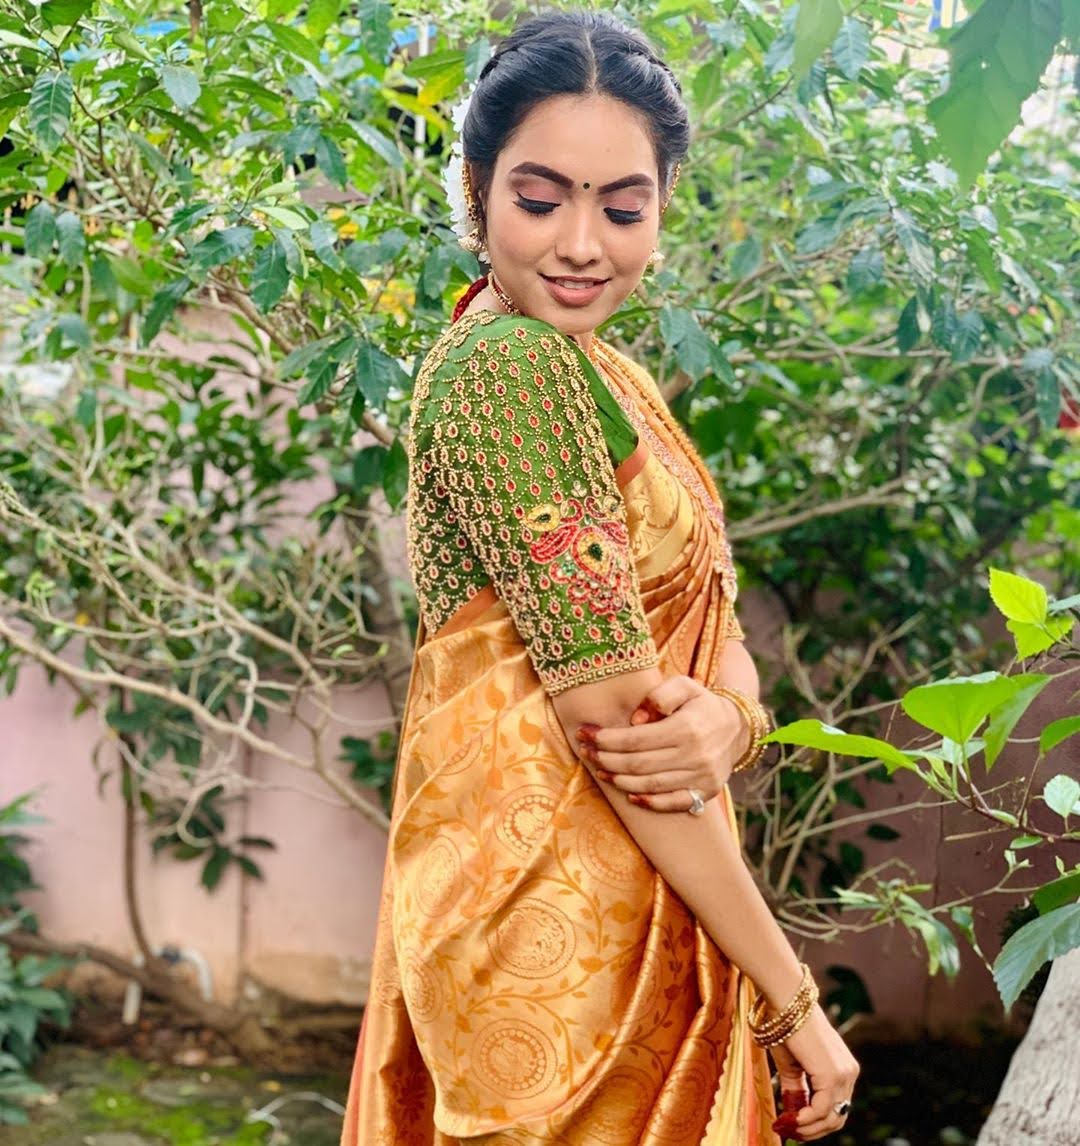 pavithra-janani-64735